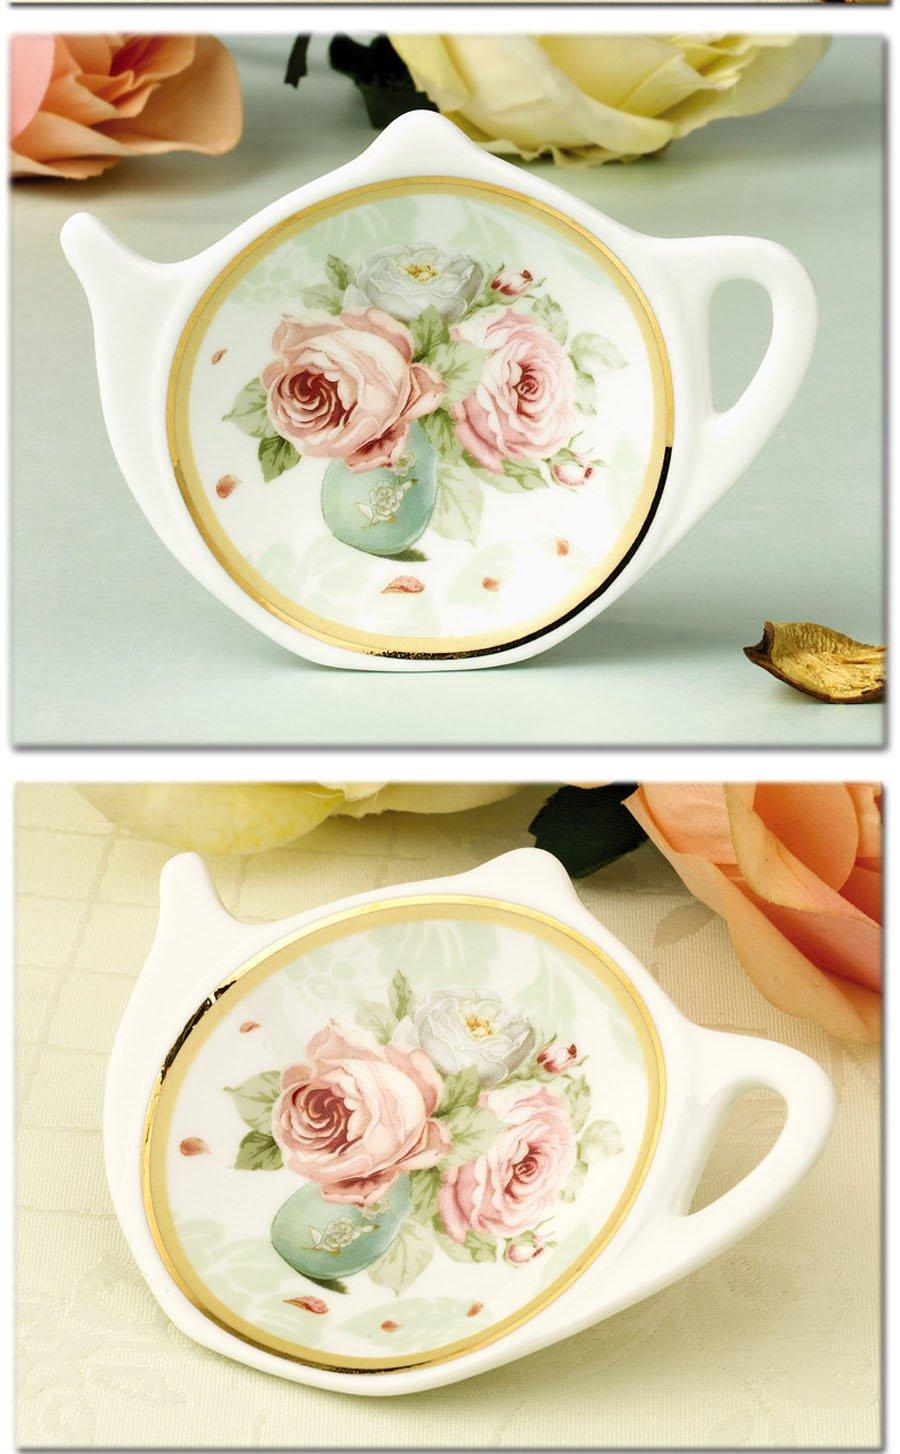 White Porcelain Ceramic with Flower Trim Gold Rim Teapot-Shaped Tea Bag Holder Tea Bag Coasters, Spoon Rests; Classic Tea Saucer Seasoning Dish Set by Linlins (Image #4)